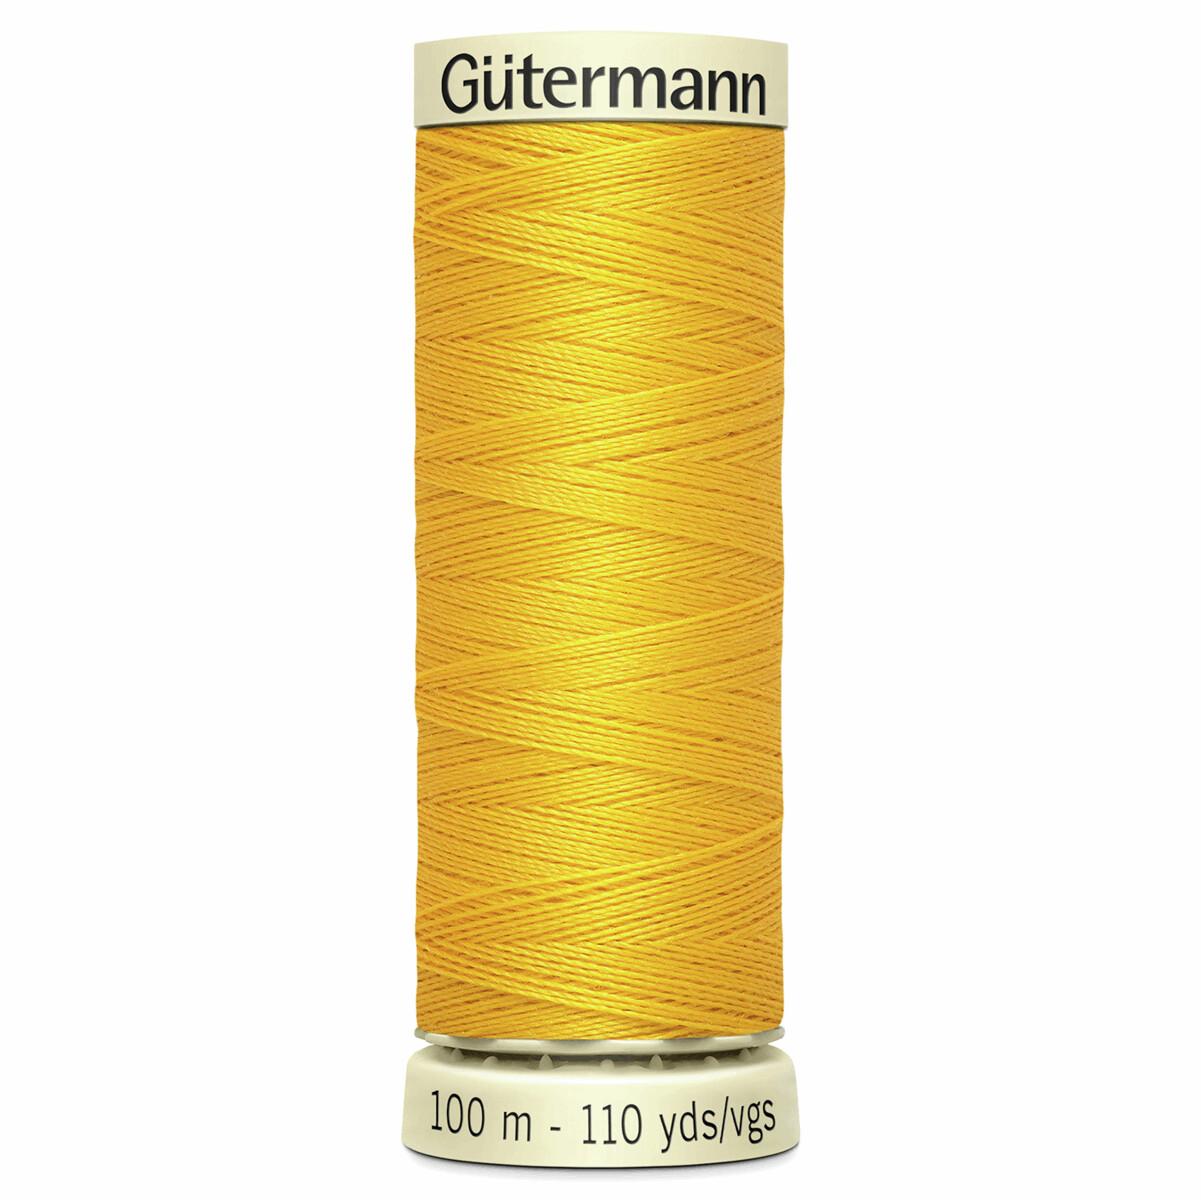 Gutermann Sew-All thread 106